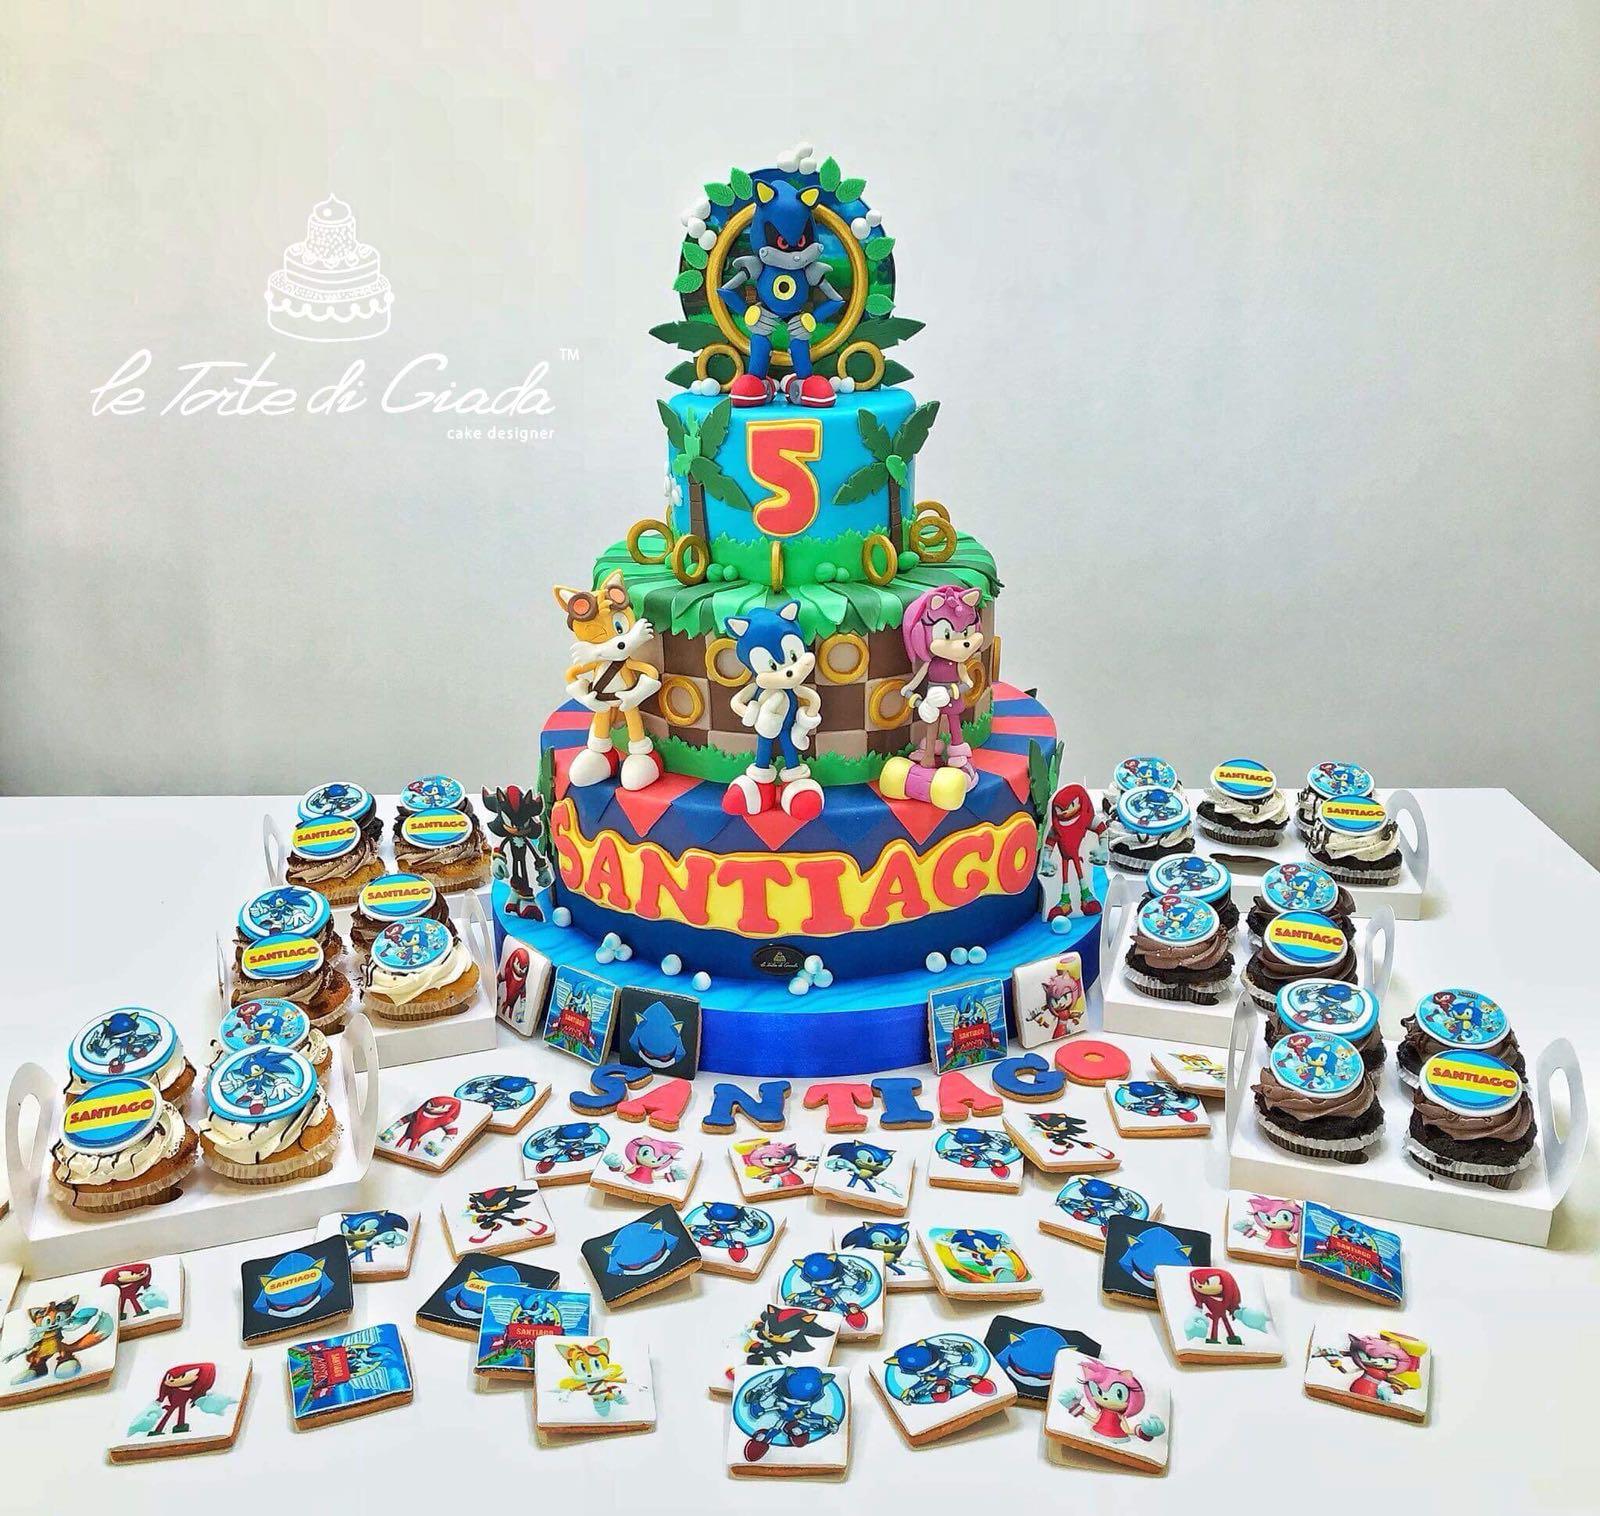 tortedigiada_santiagodemartino_compleanno